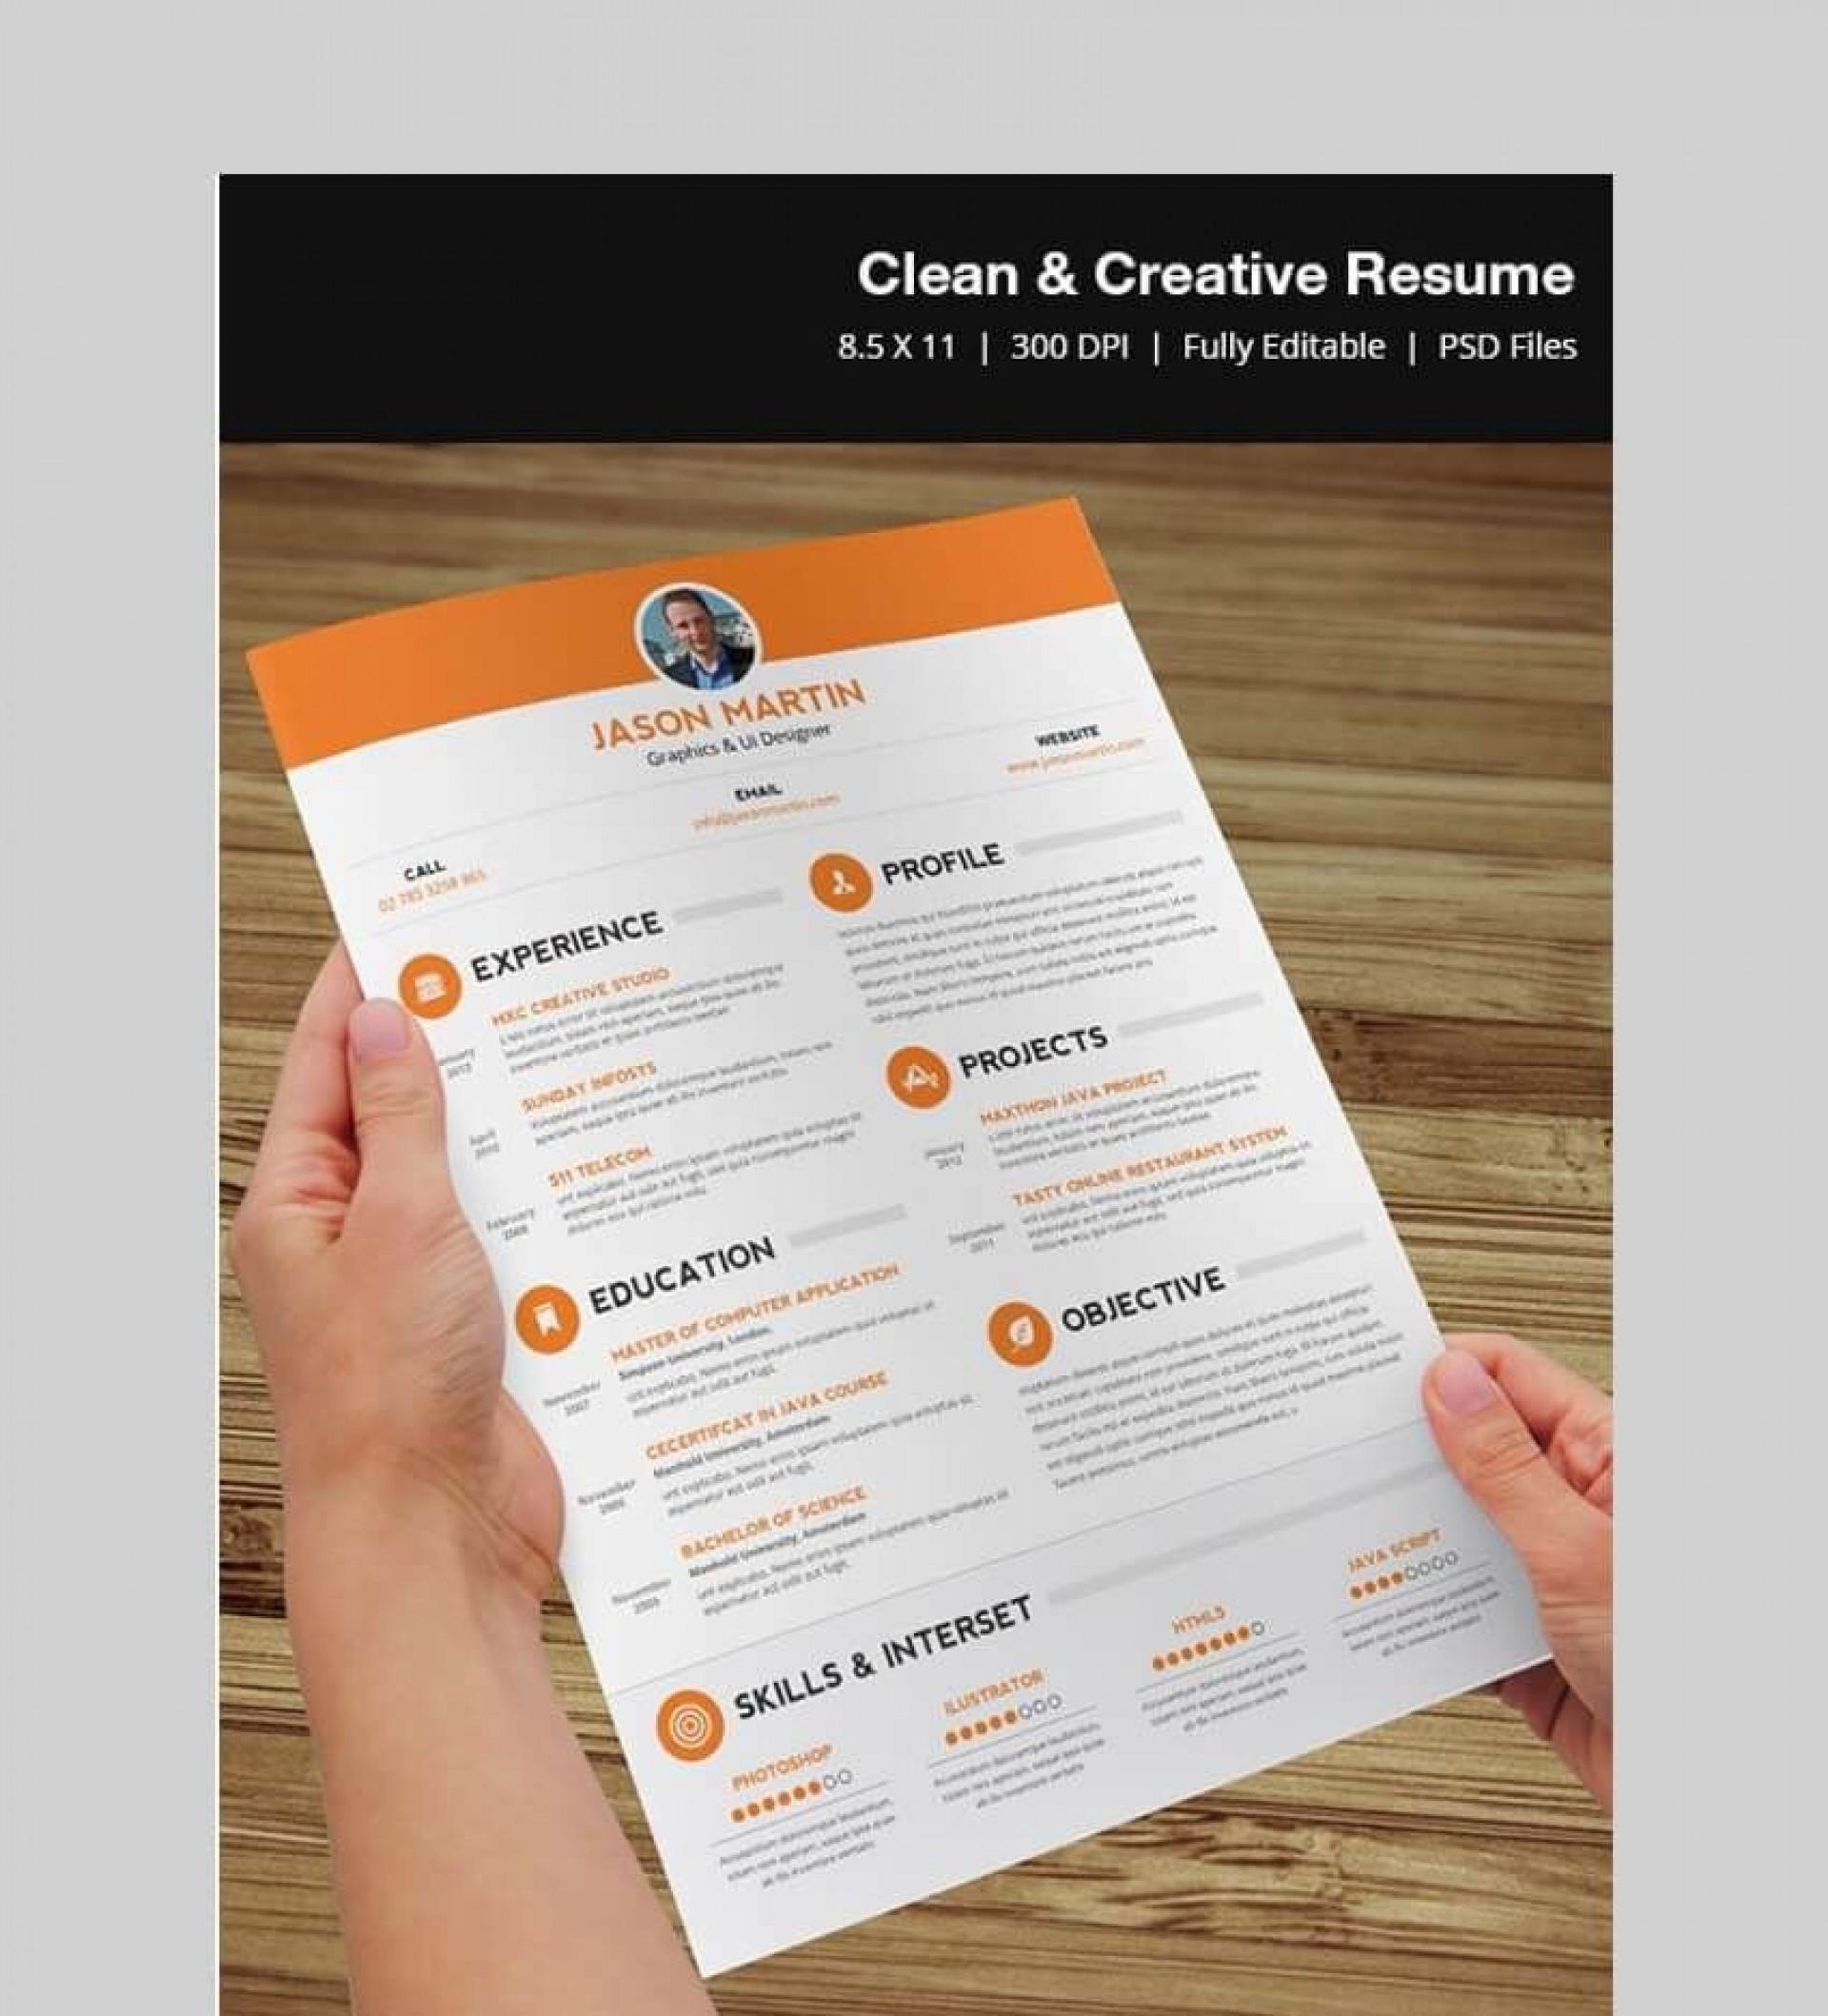 008 Phenomenal Creative Resume Template Free Download Psd Idea  Cv1920